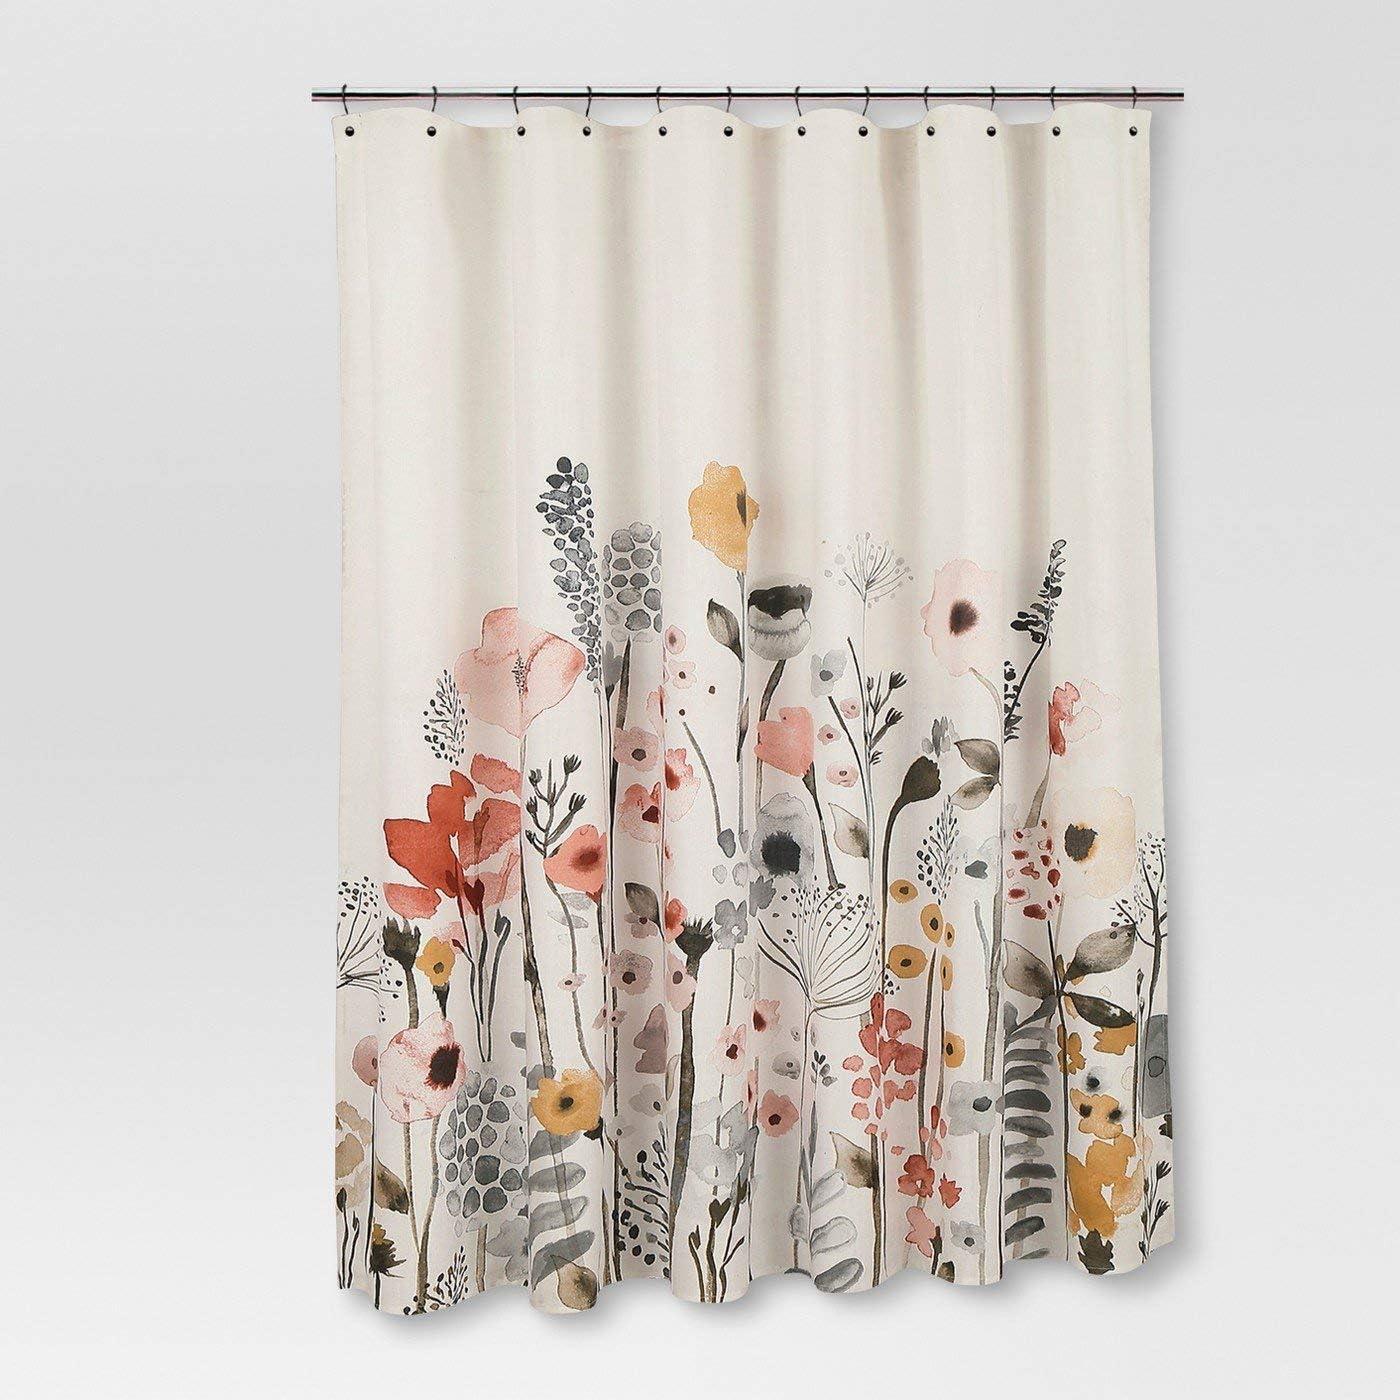 Threshold Floral Wave Shower Curtain 100 Cotton 72 X 72 Amazon Ca Home Kitchen